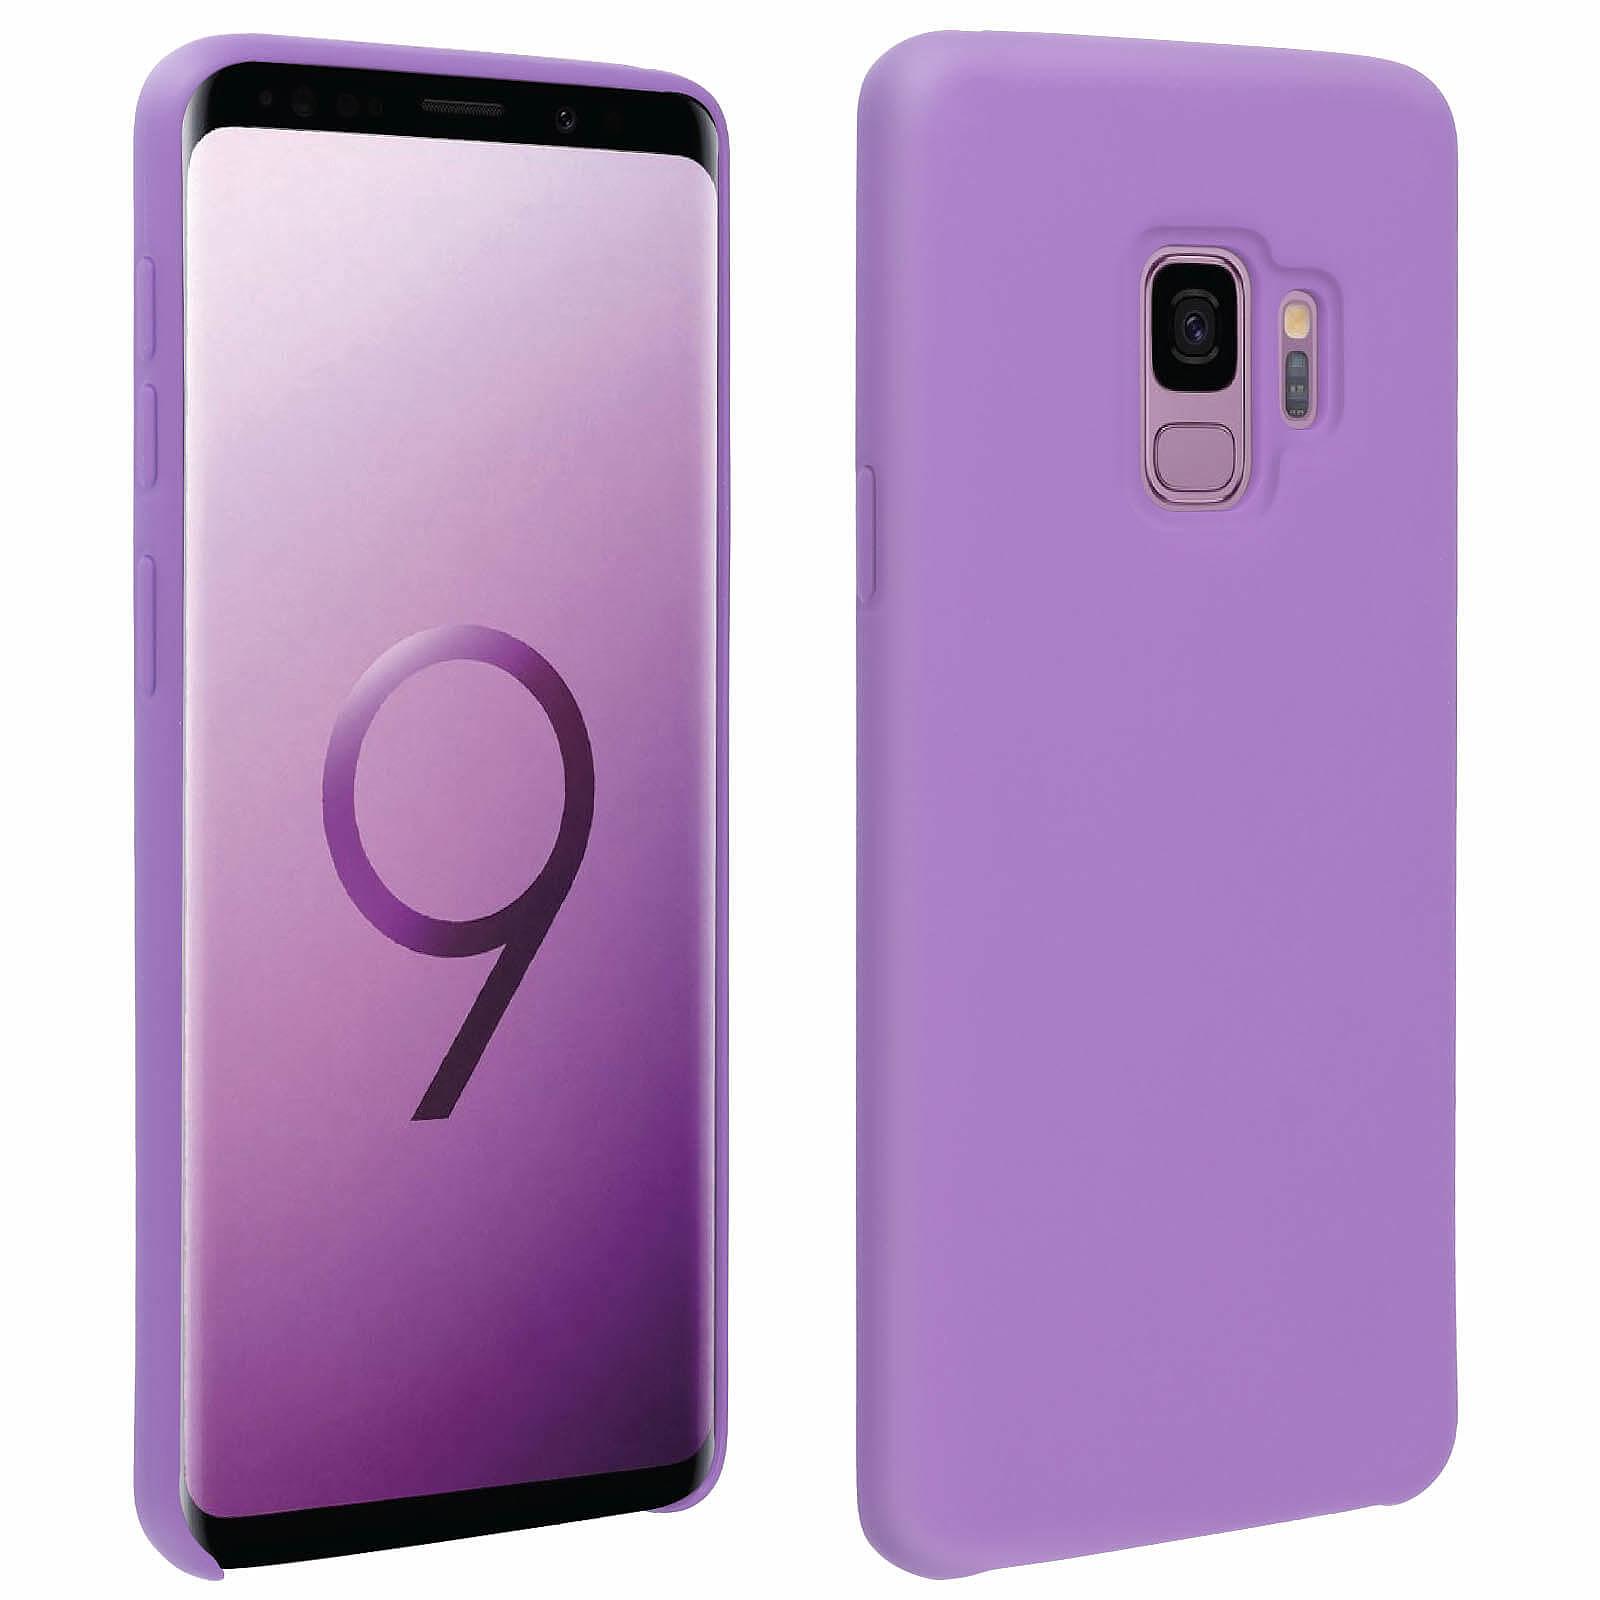 Avizar Coque Violet pour Samsung Galaxy S9